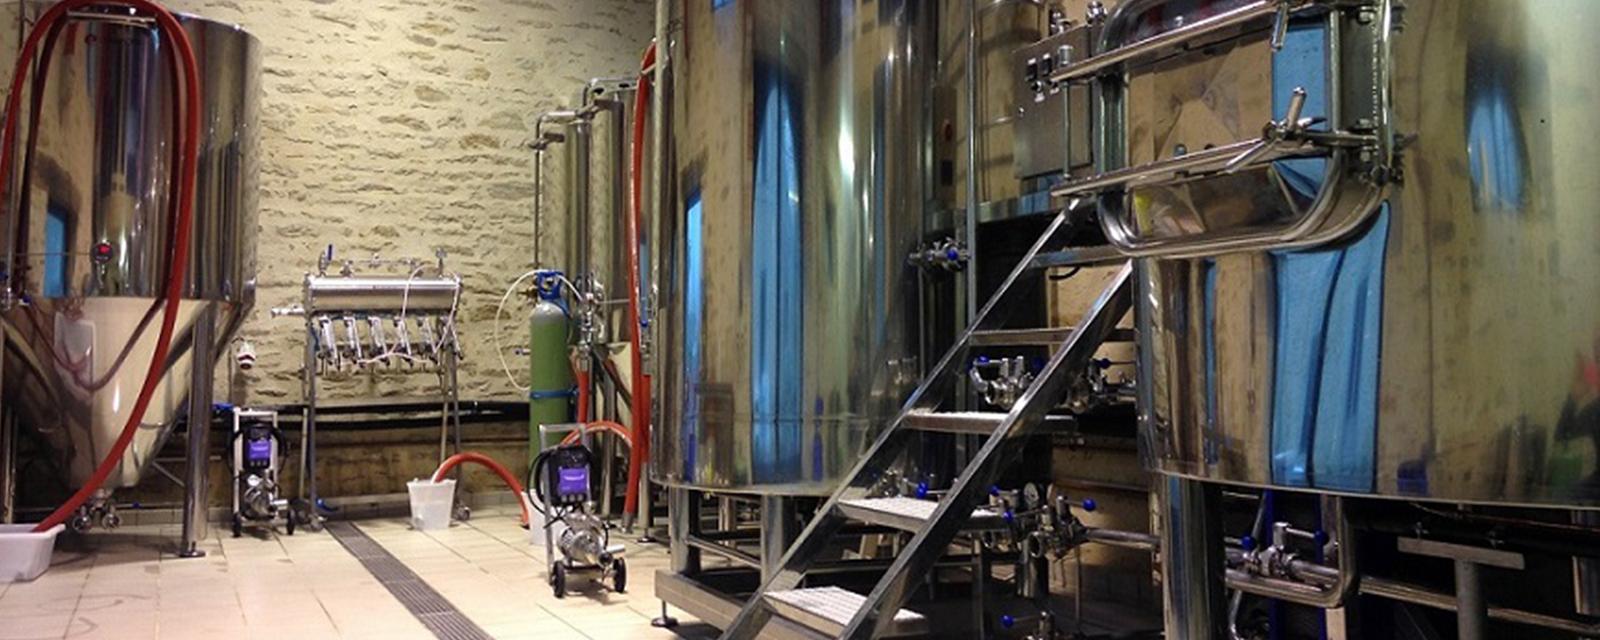 Wannen der Cornouaille Brauerei in Concarneau